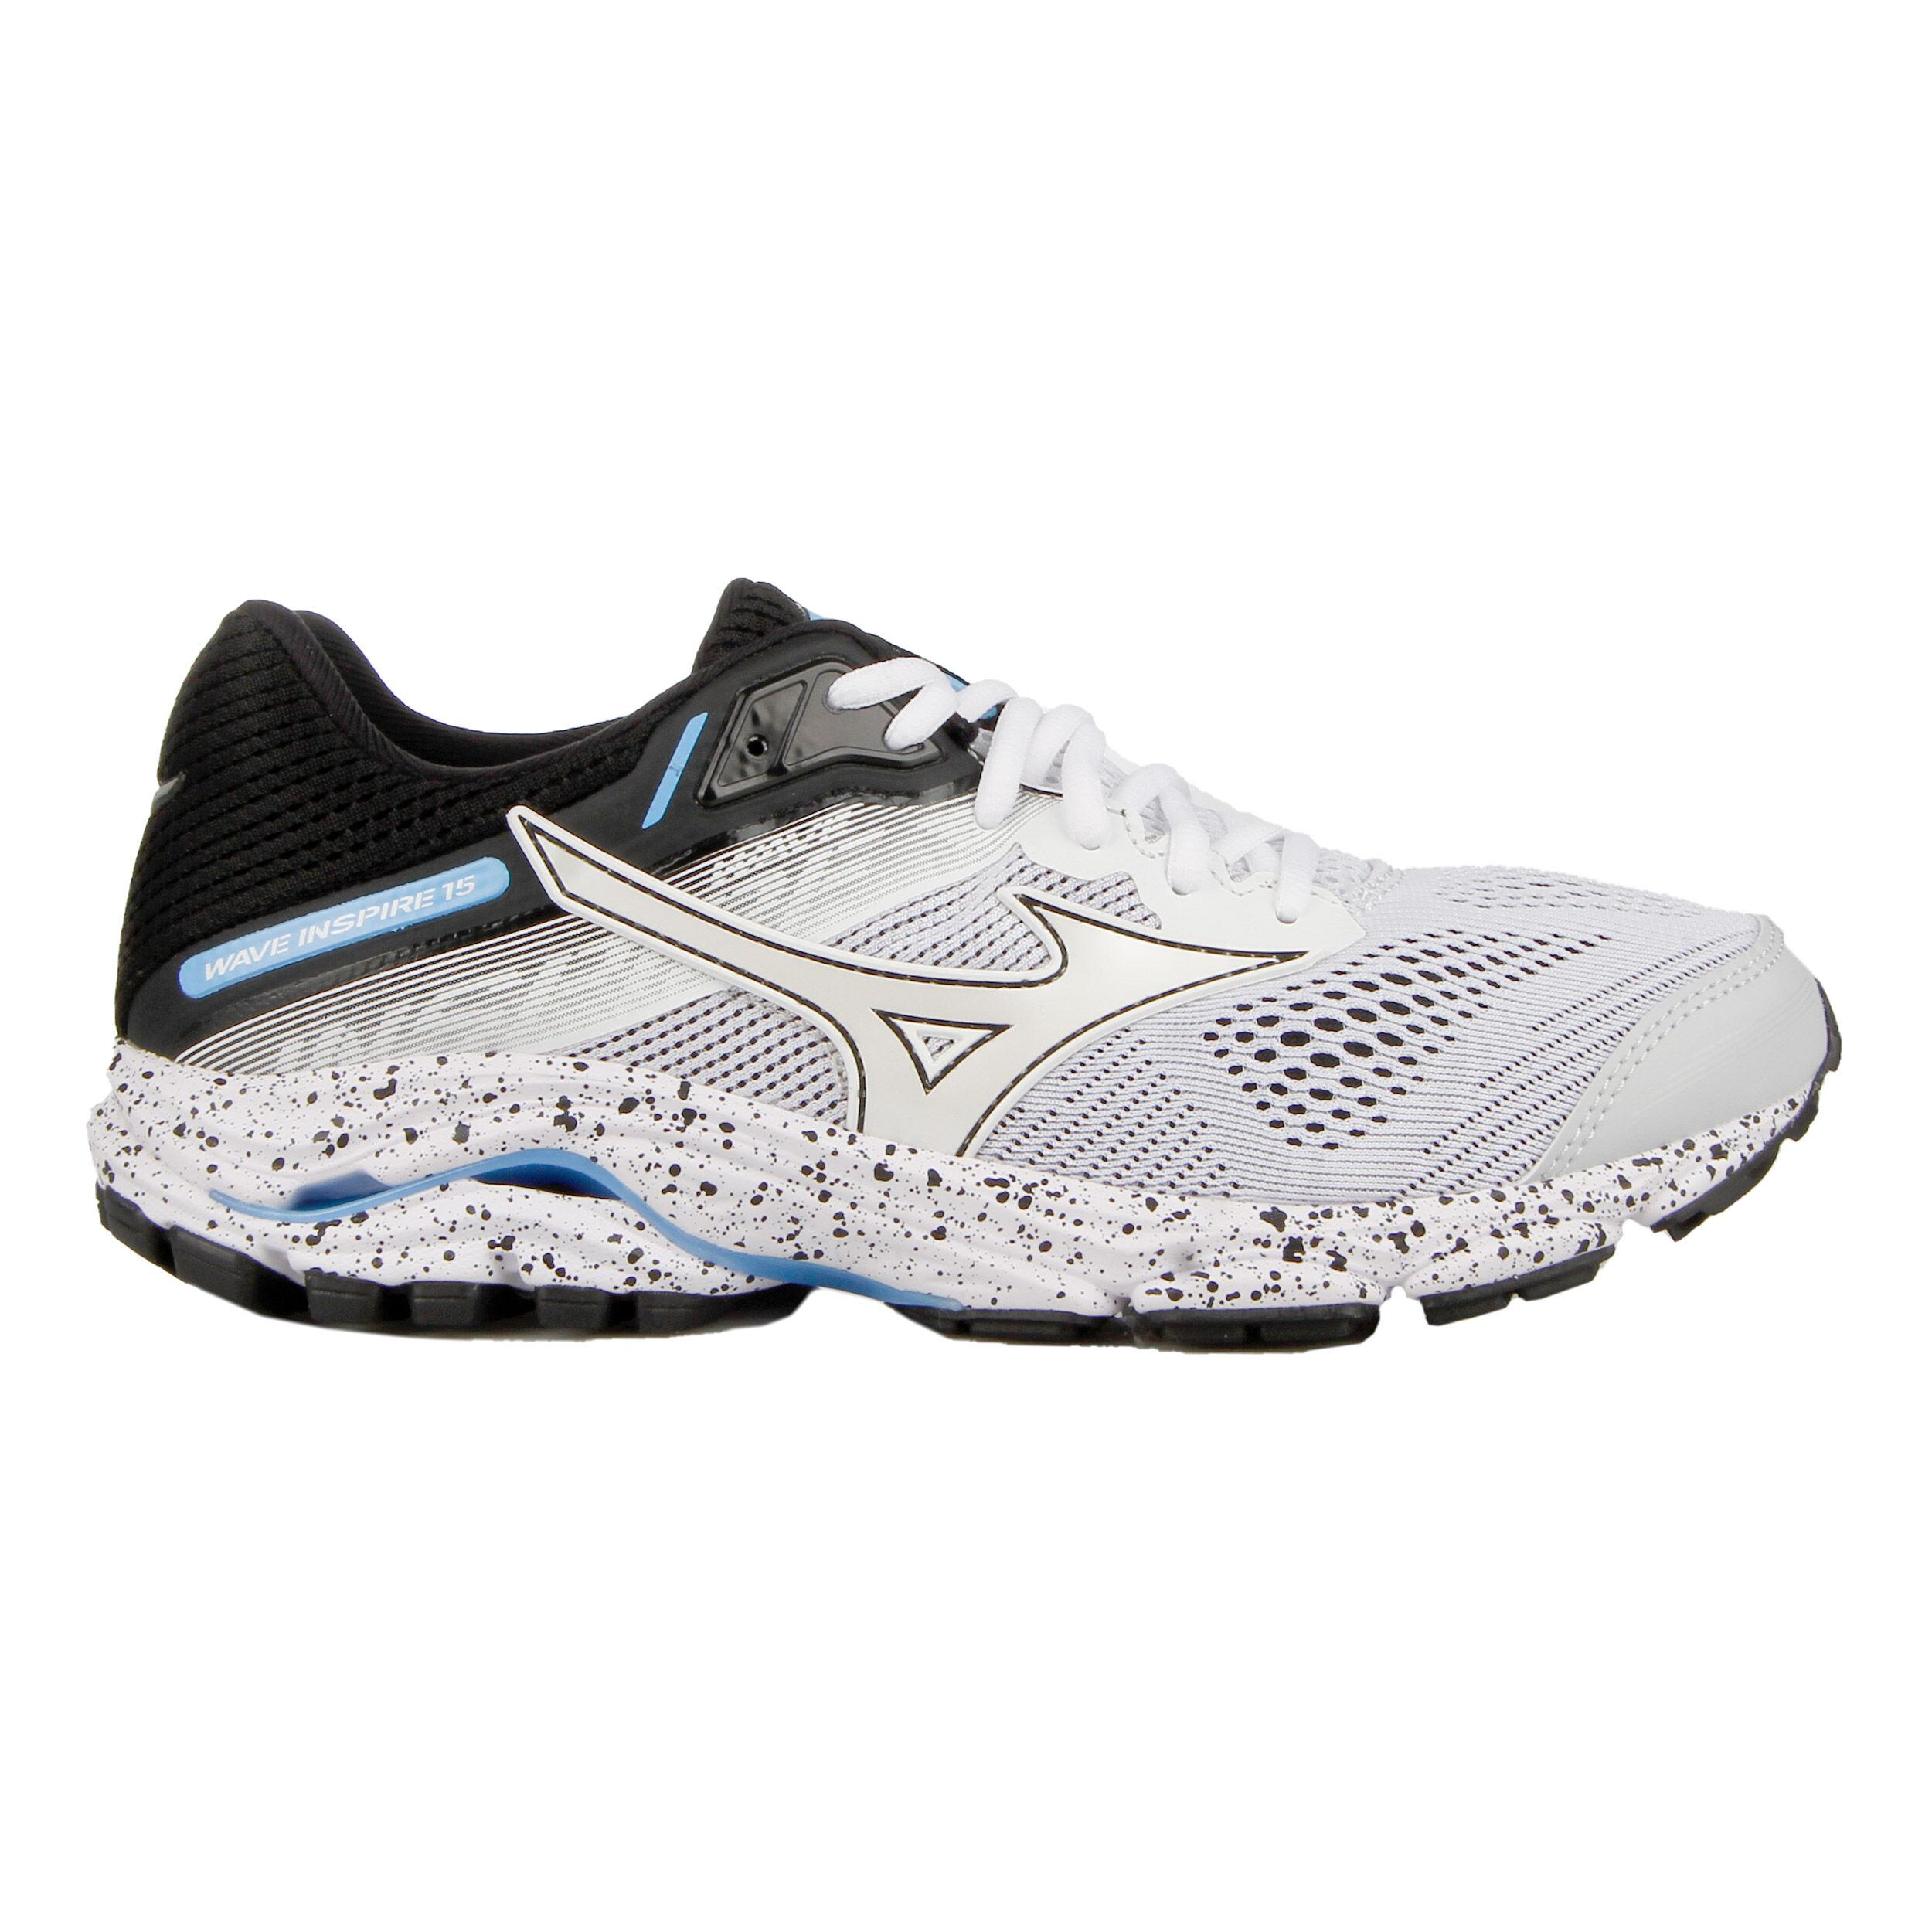 mizuno running shoes size 15 herren 48 feet